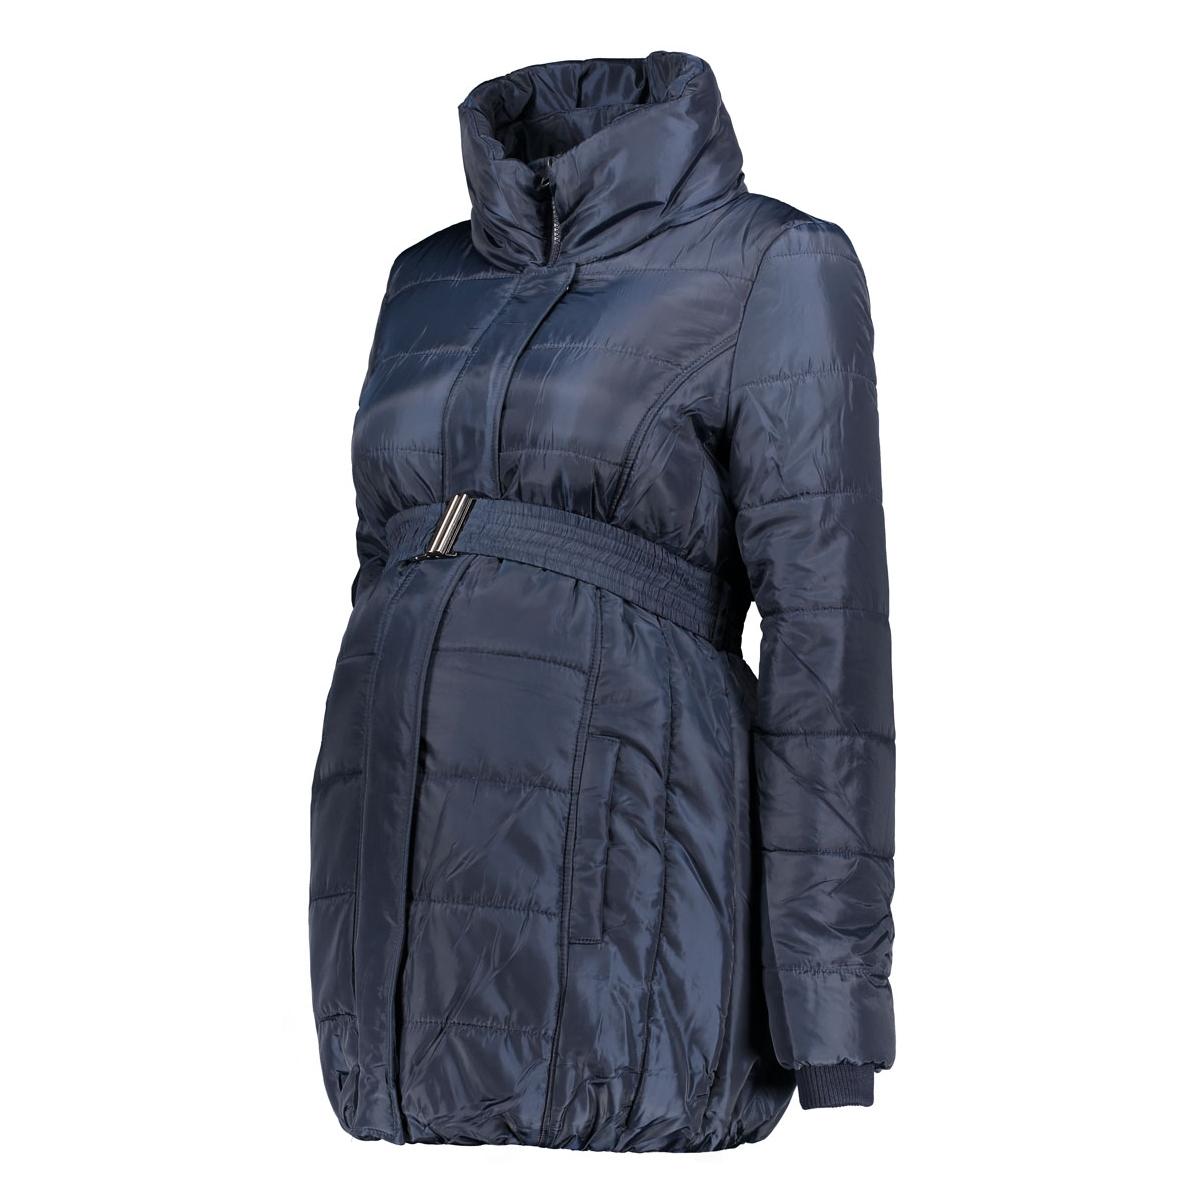 mlquilty l/s padded jacket 20006282 mama-licious positie jas navy blazer